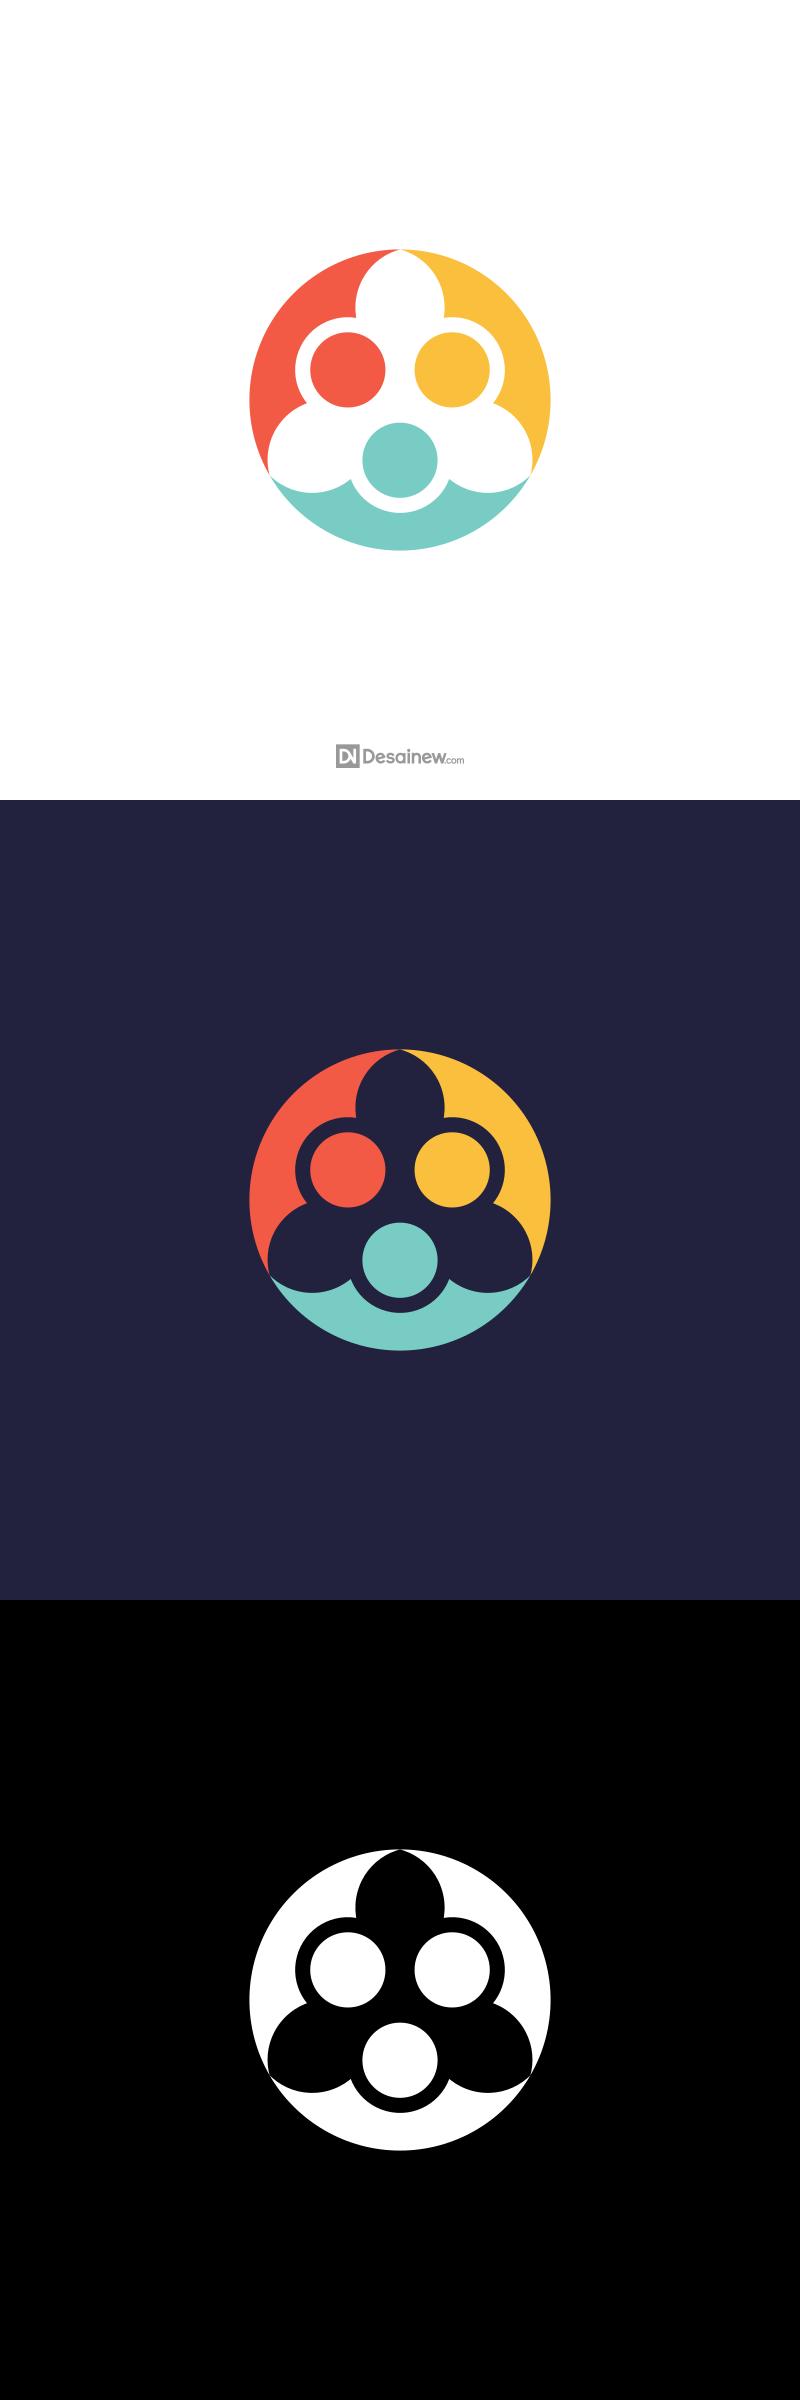 Manage Community Logo Design Project Portfolio Desainew Studio